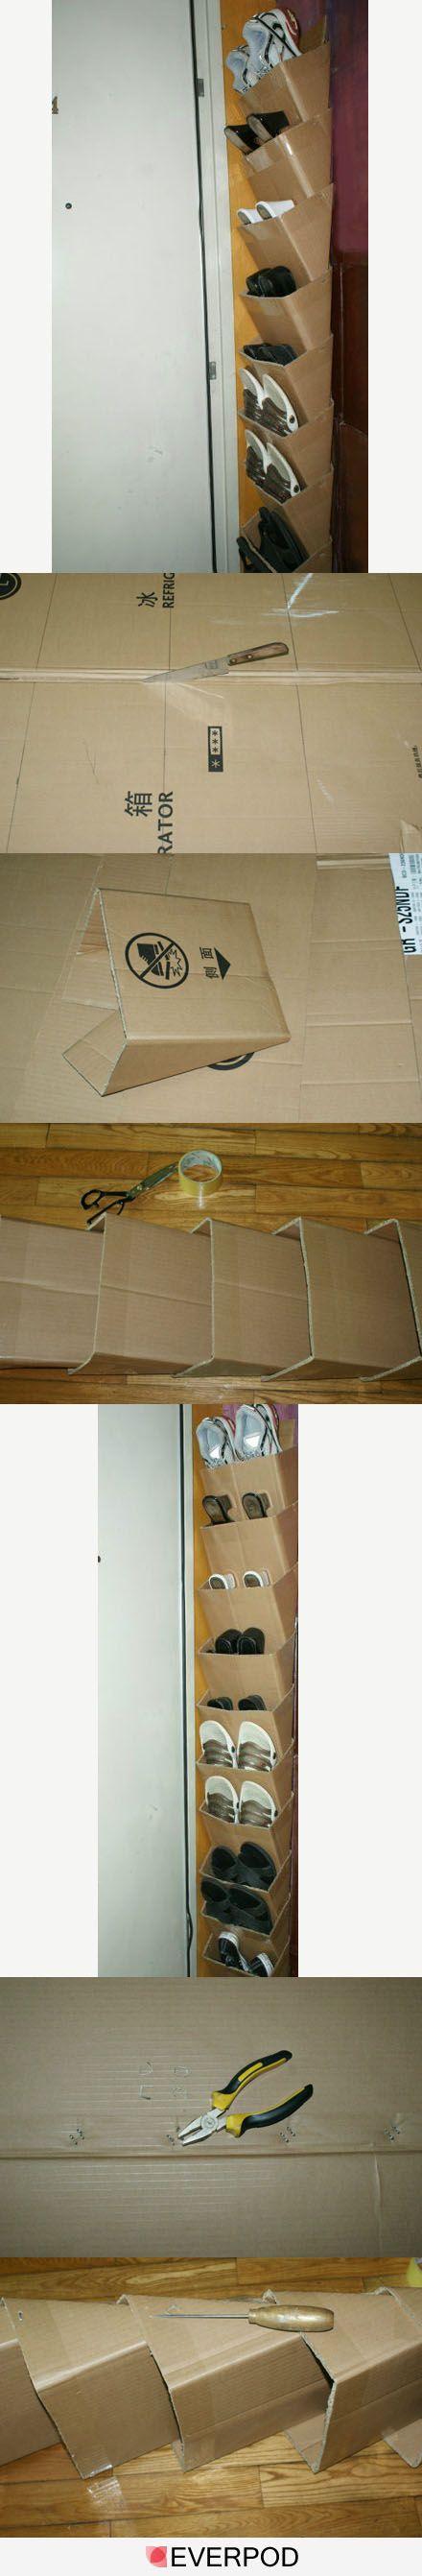 zapatero de cajas de cartón: